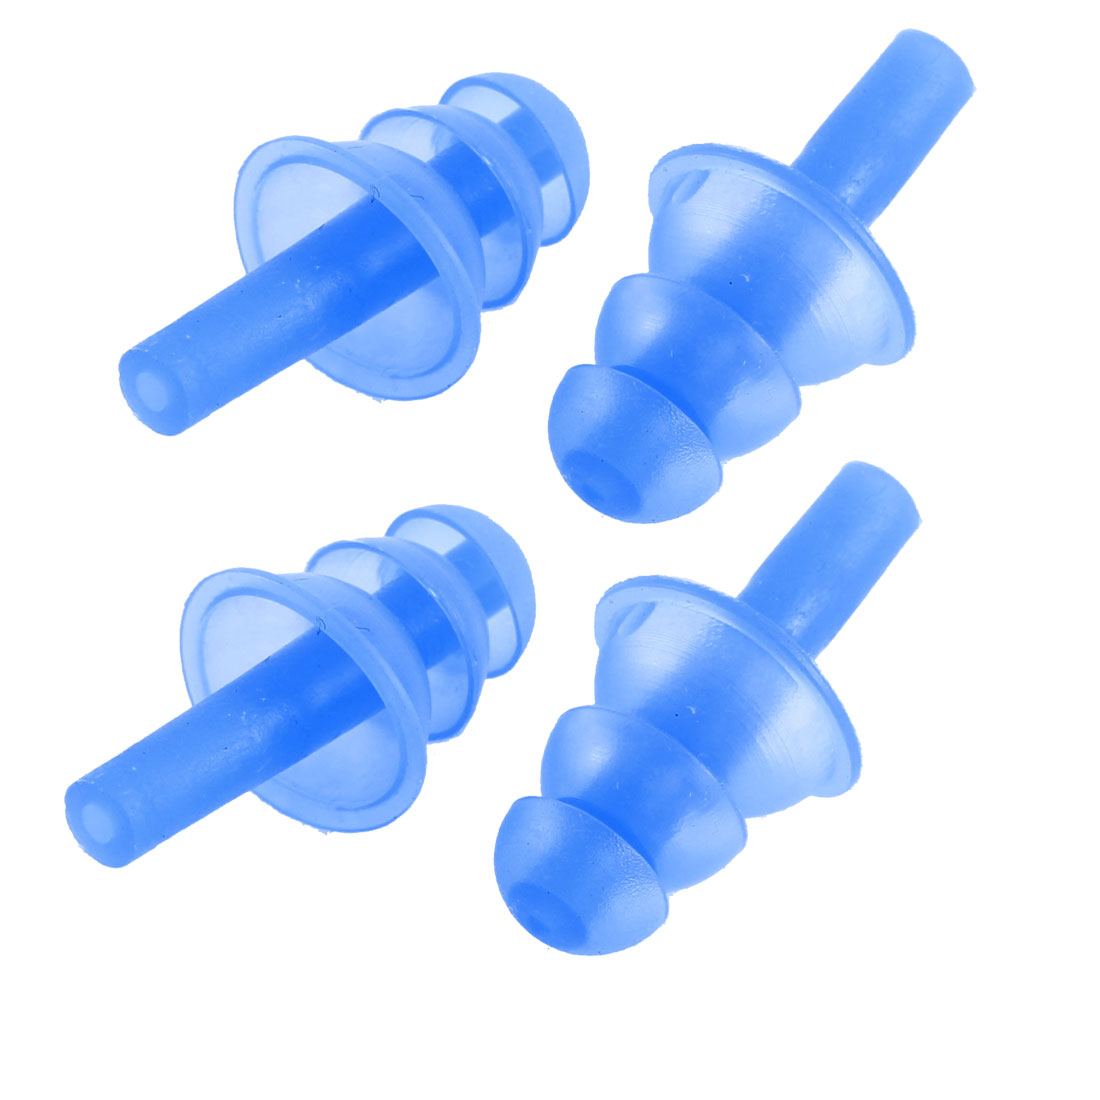 Unique Bargains 4 Pcs Blue Water Sports Swimming Swim Ear Plugs Protector Earplugs